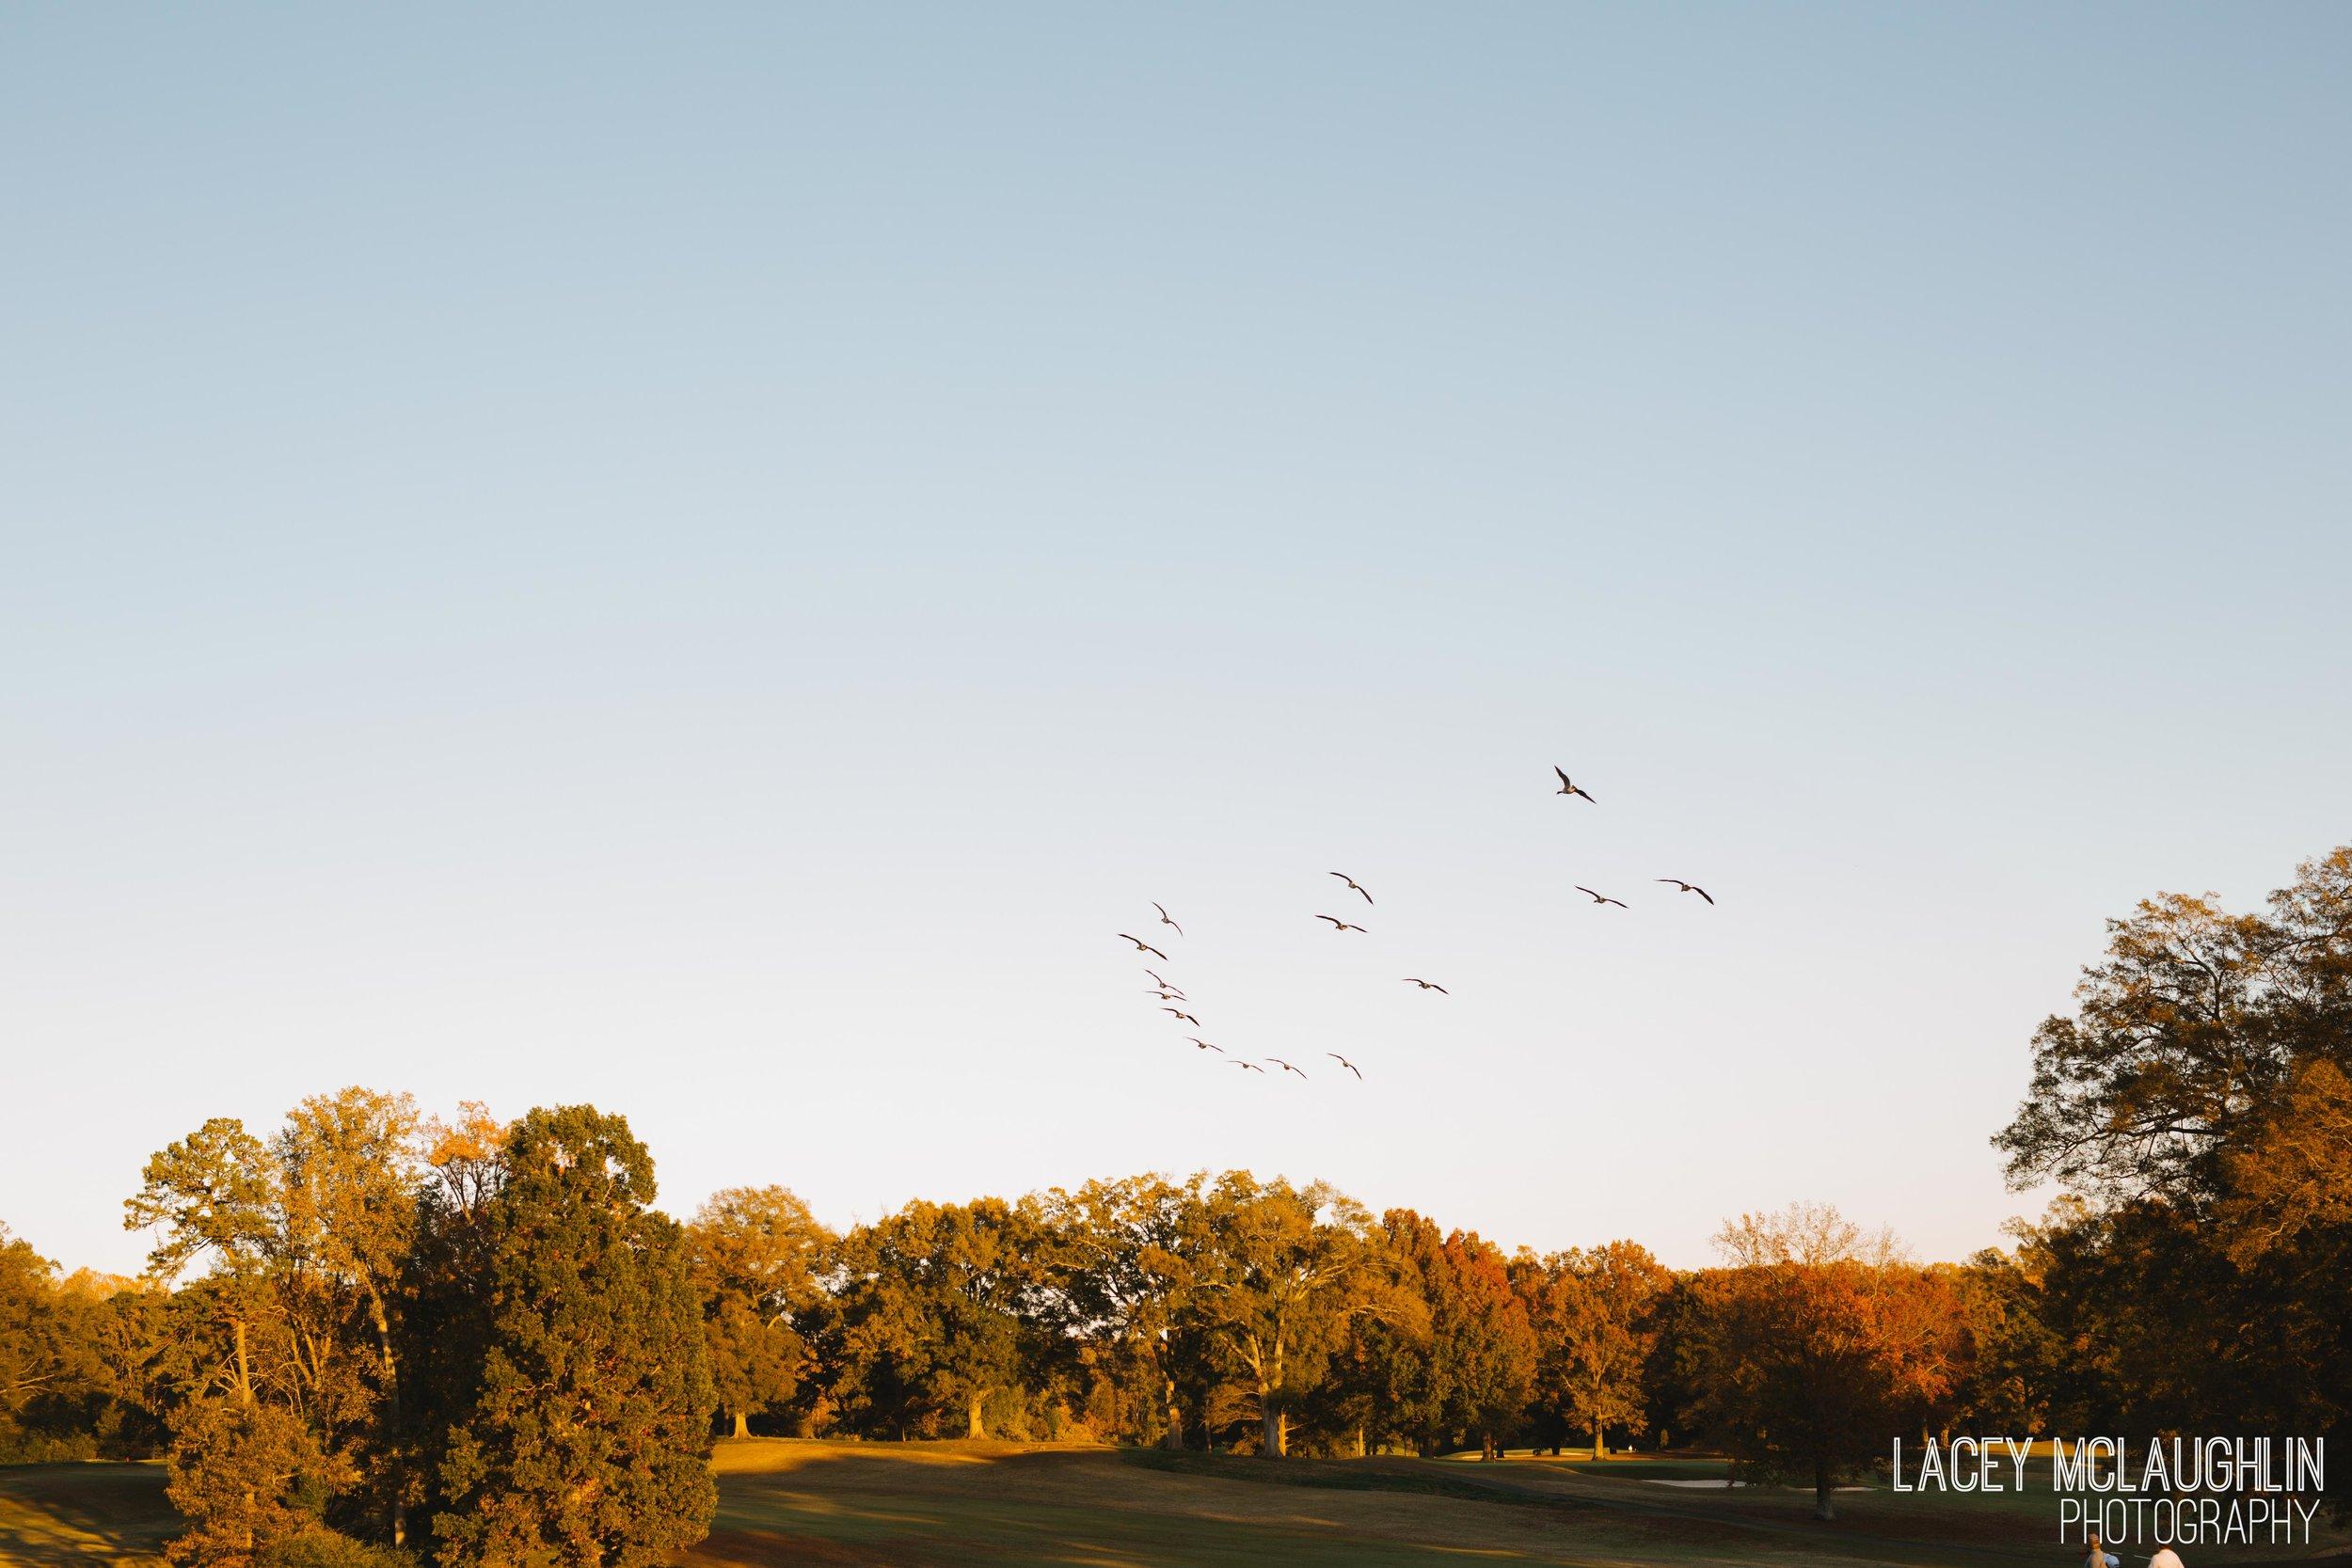 LaceyMcLaughlinPhoto-14.jpg